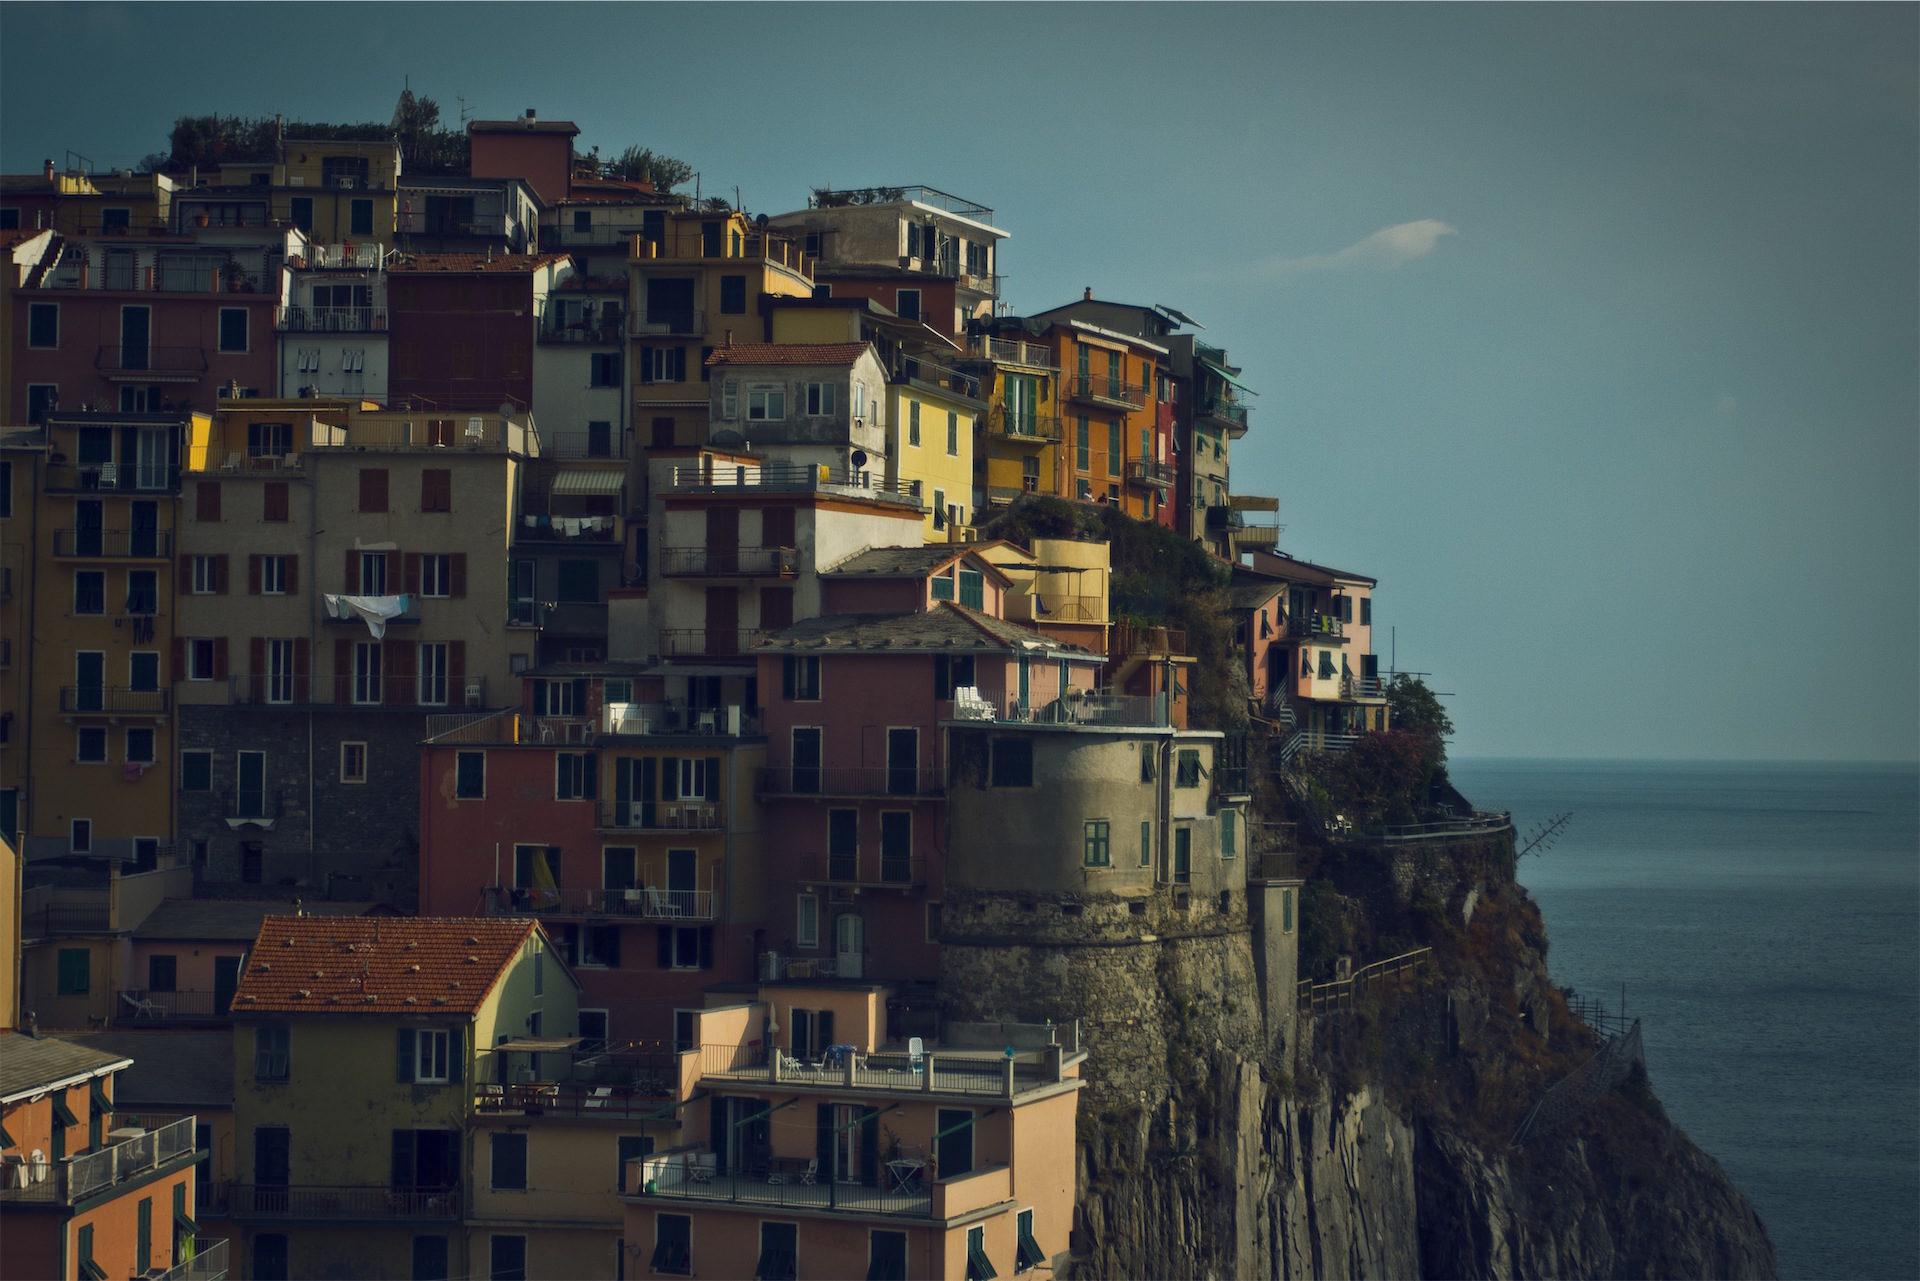 Häuser, bunte, Cliff, Meer, Dorf - Wallpaper HD - Prof.-falken.com